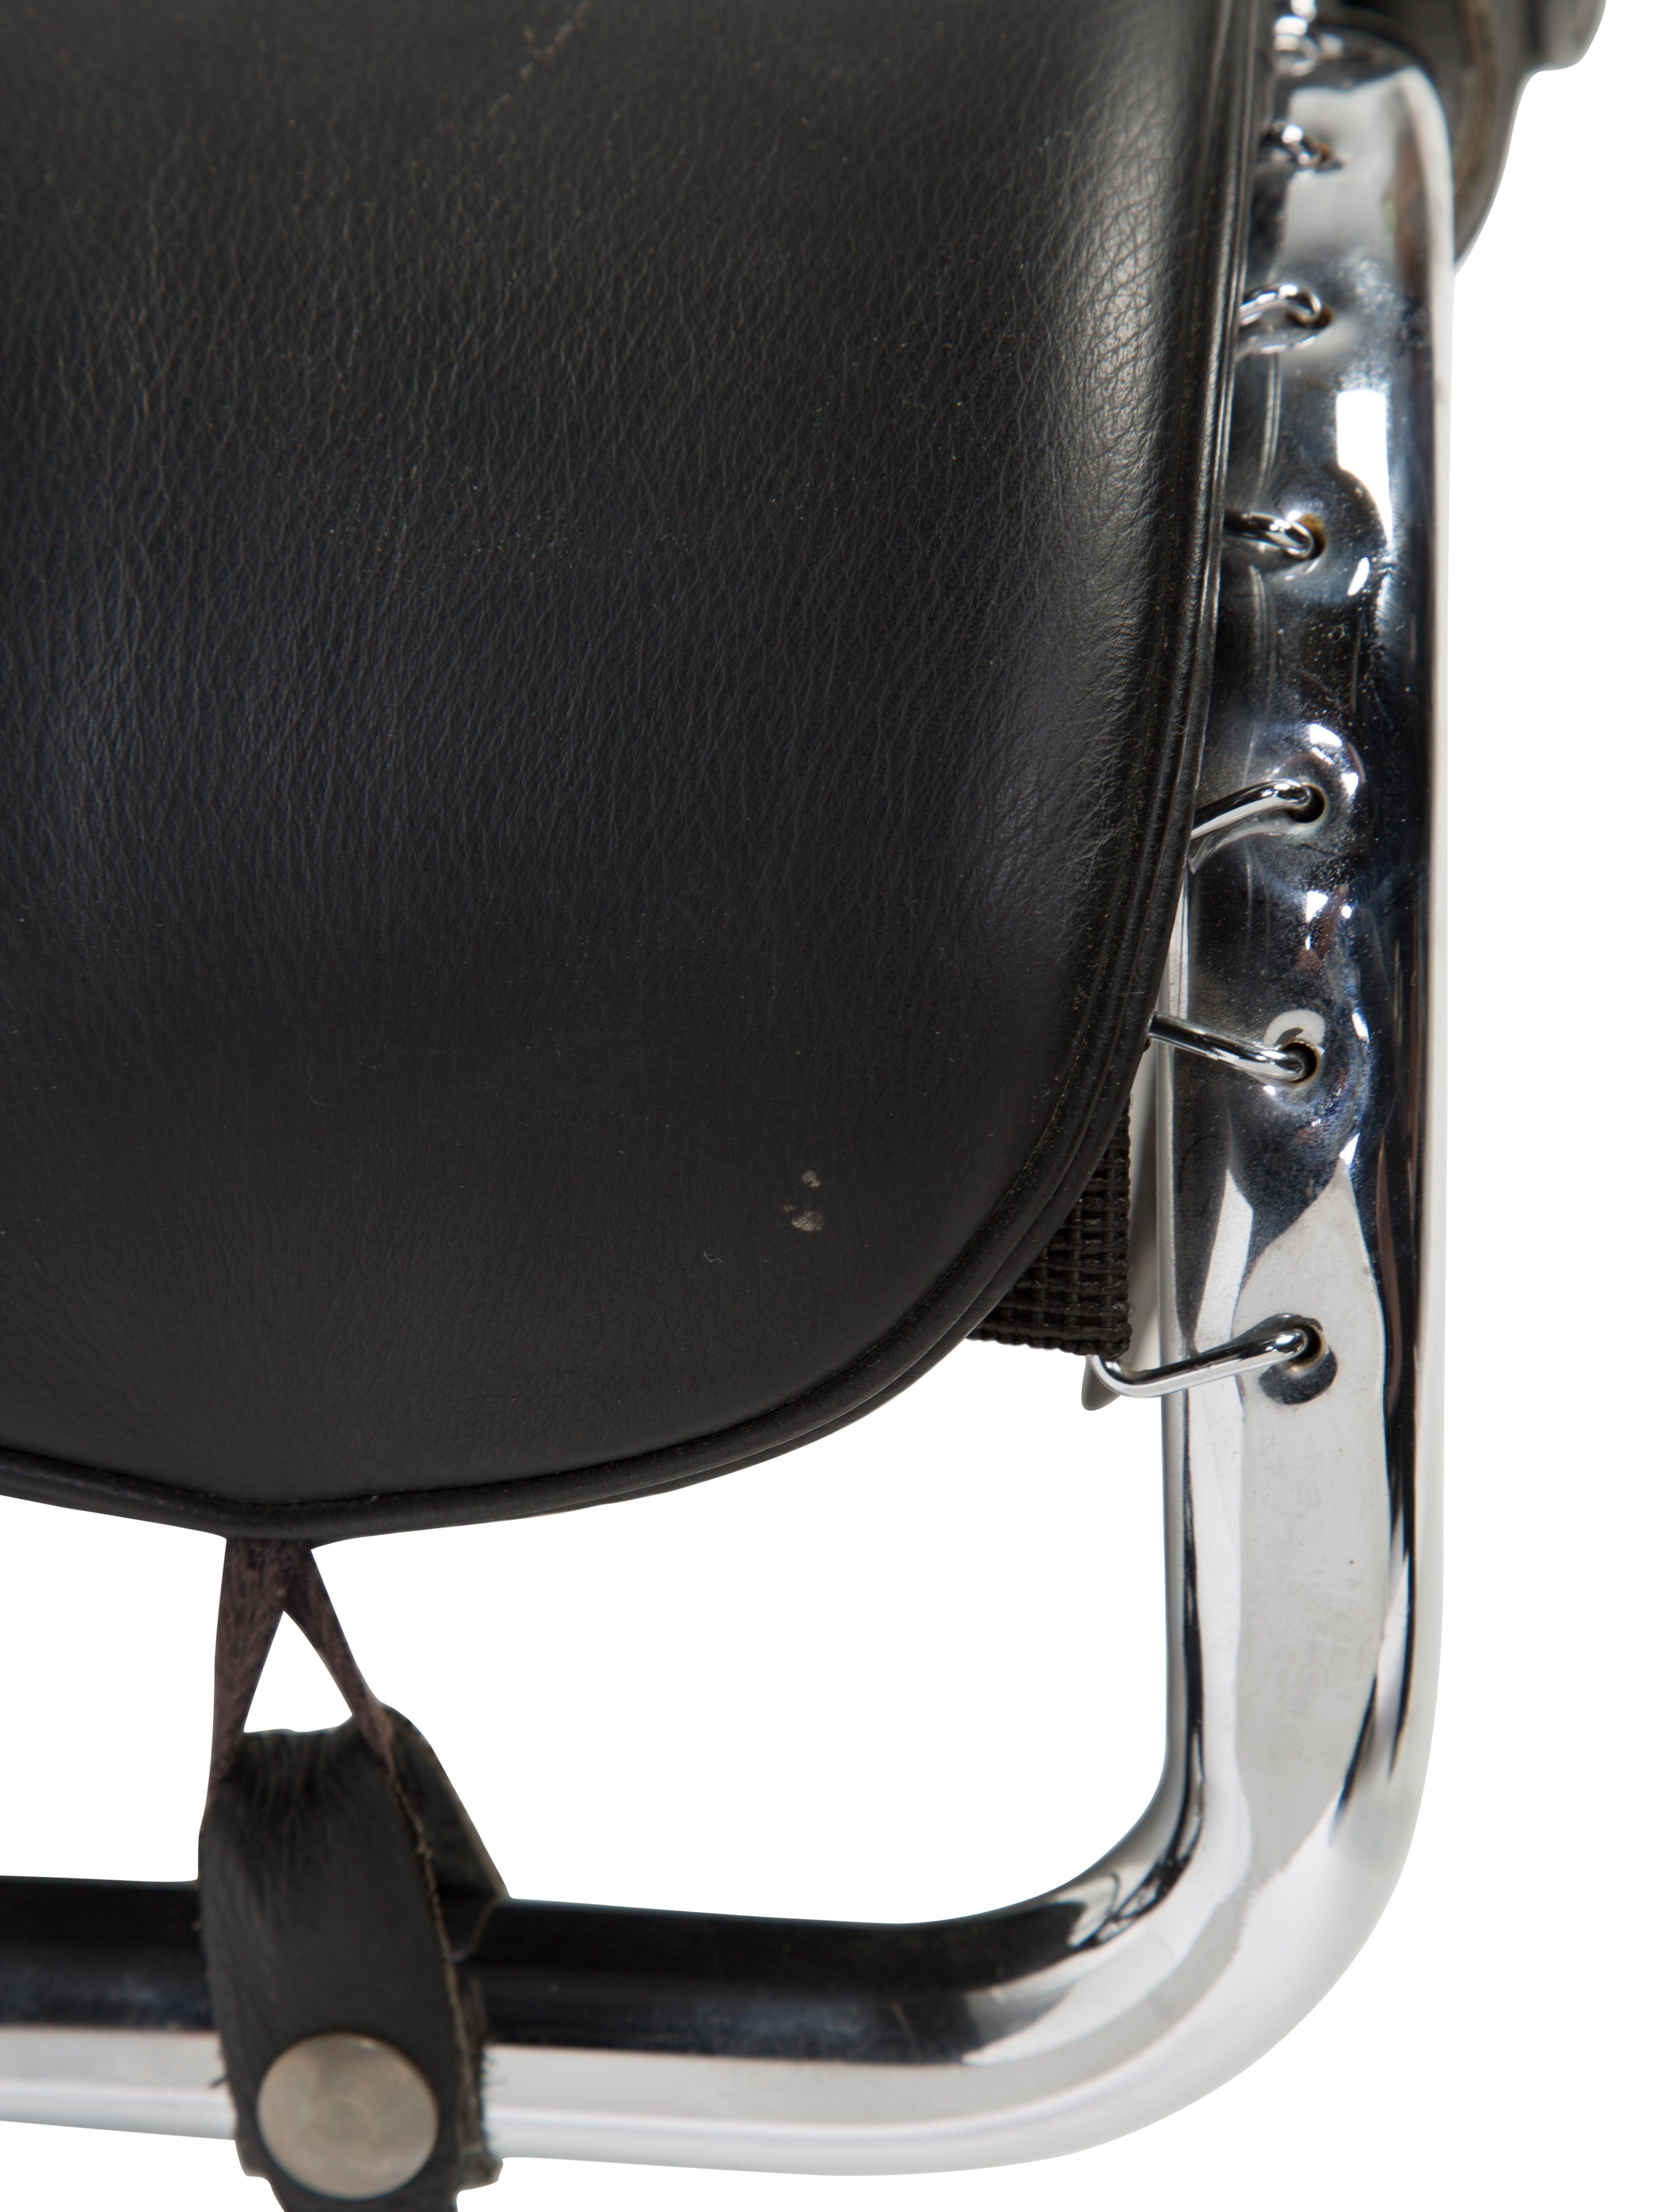 Cassina Le Corbusier Lc4 Chaise Lounge Furniture